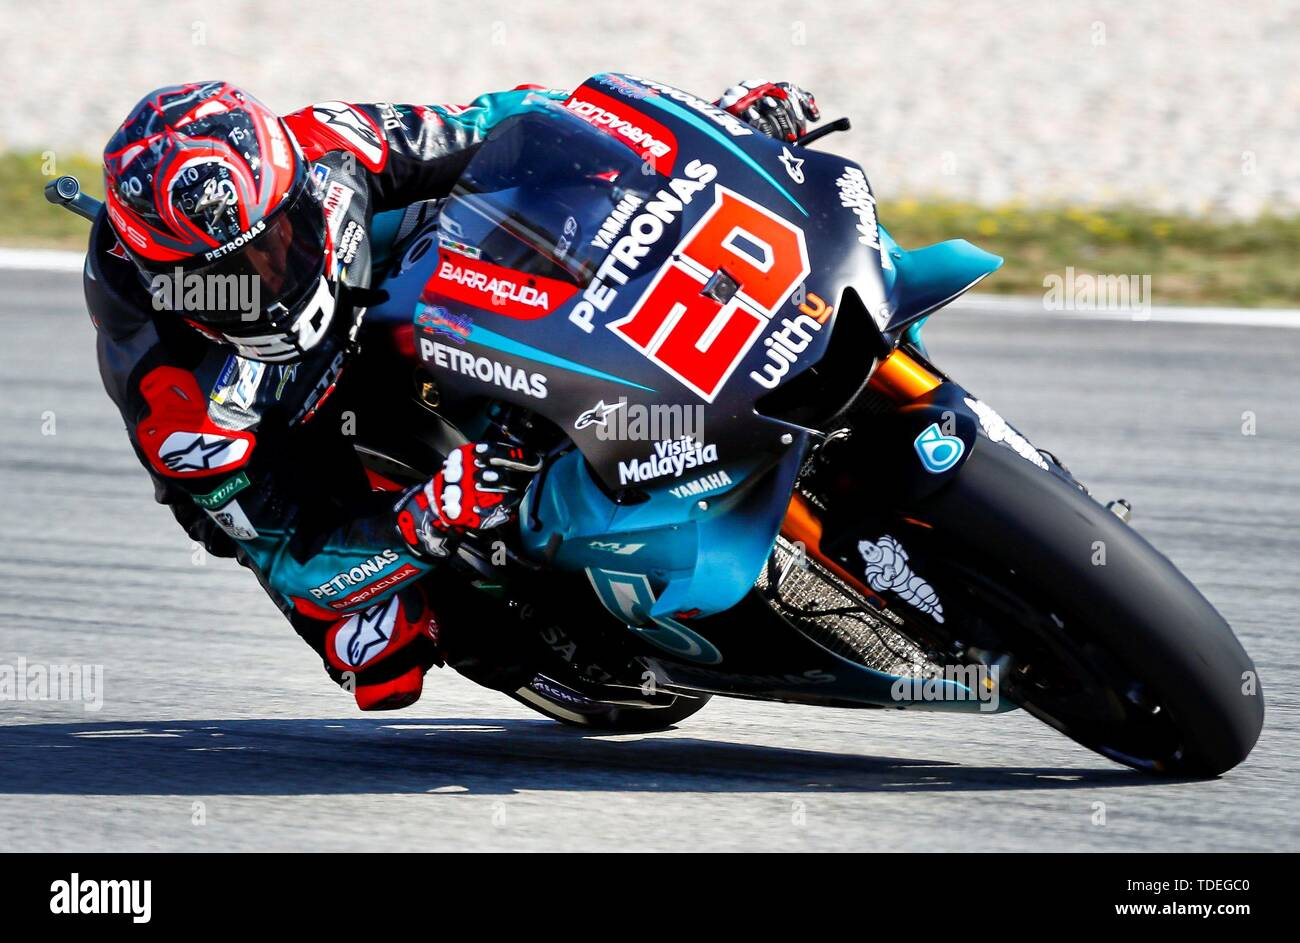 French Motogp Rider Fabio Quartararo Of The Petronas Yamaha Team Takes A Bend During The Third